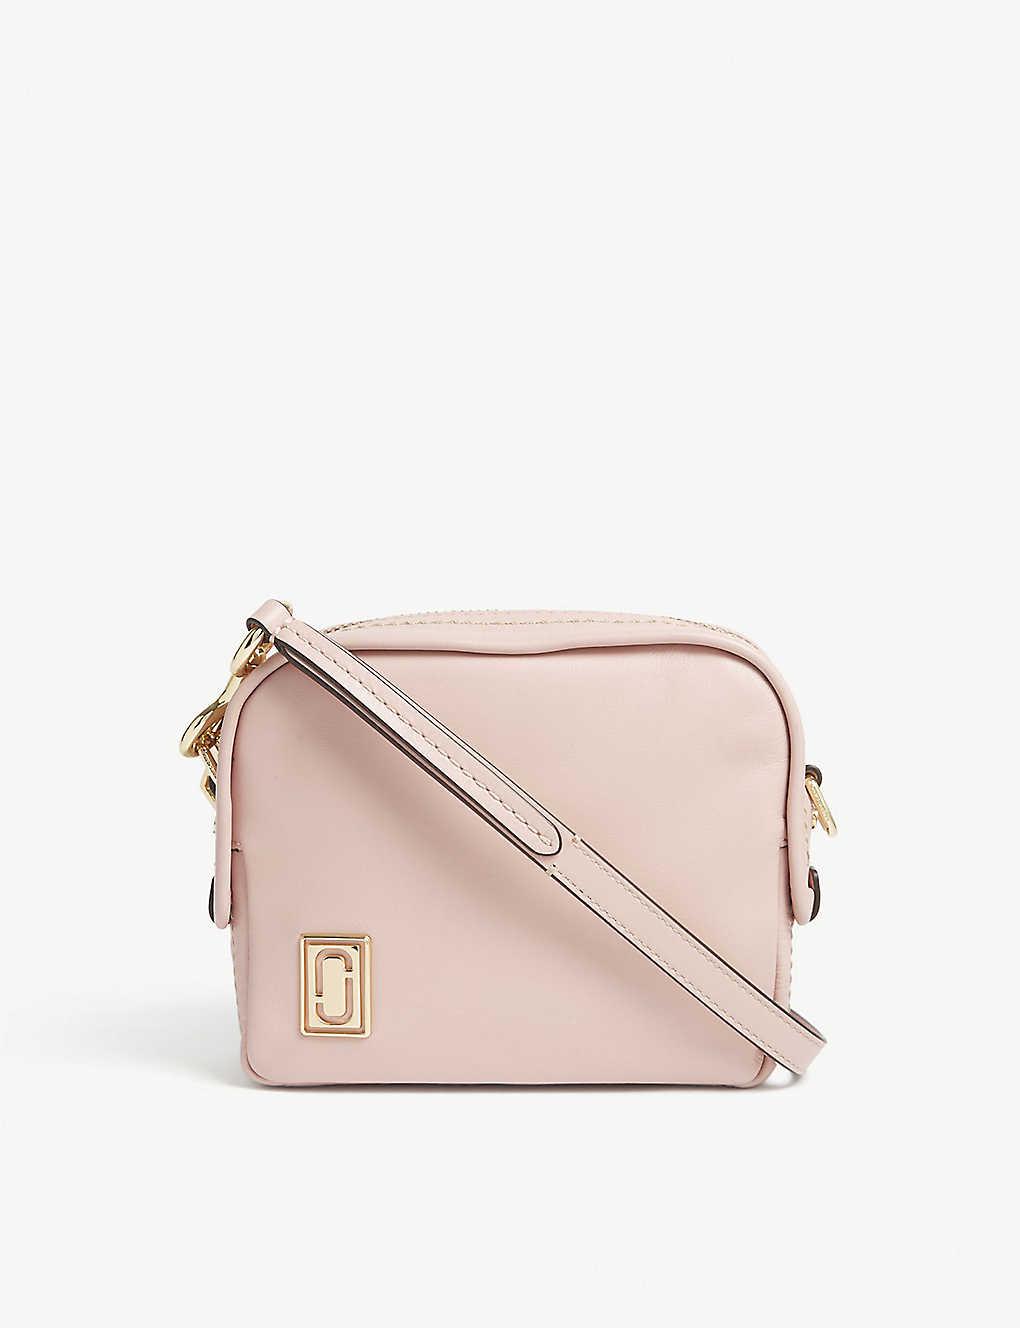 613d9b56e87 MARC JACOBS - Mini Squeeze leather cross-body bag